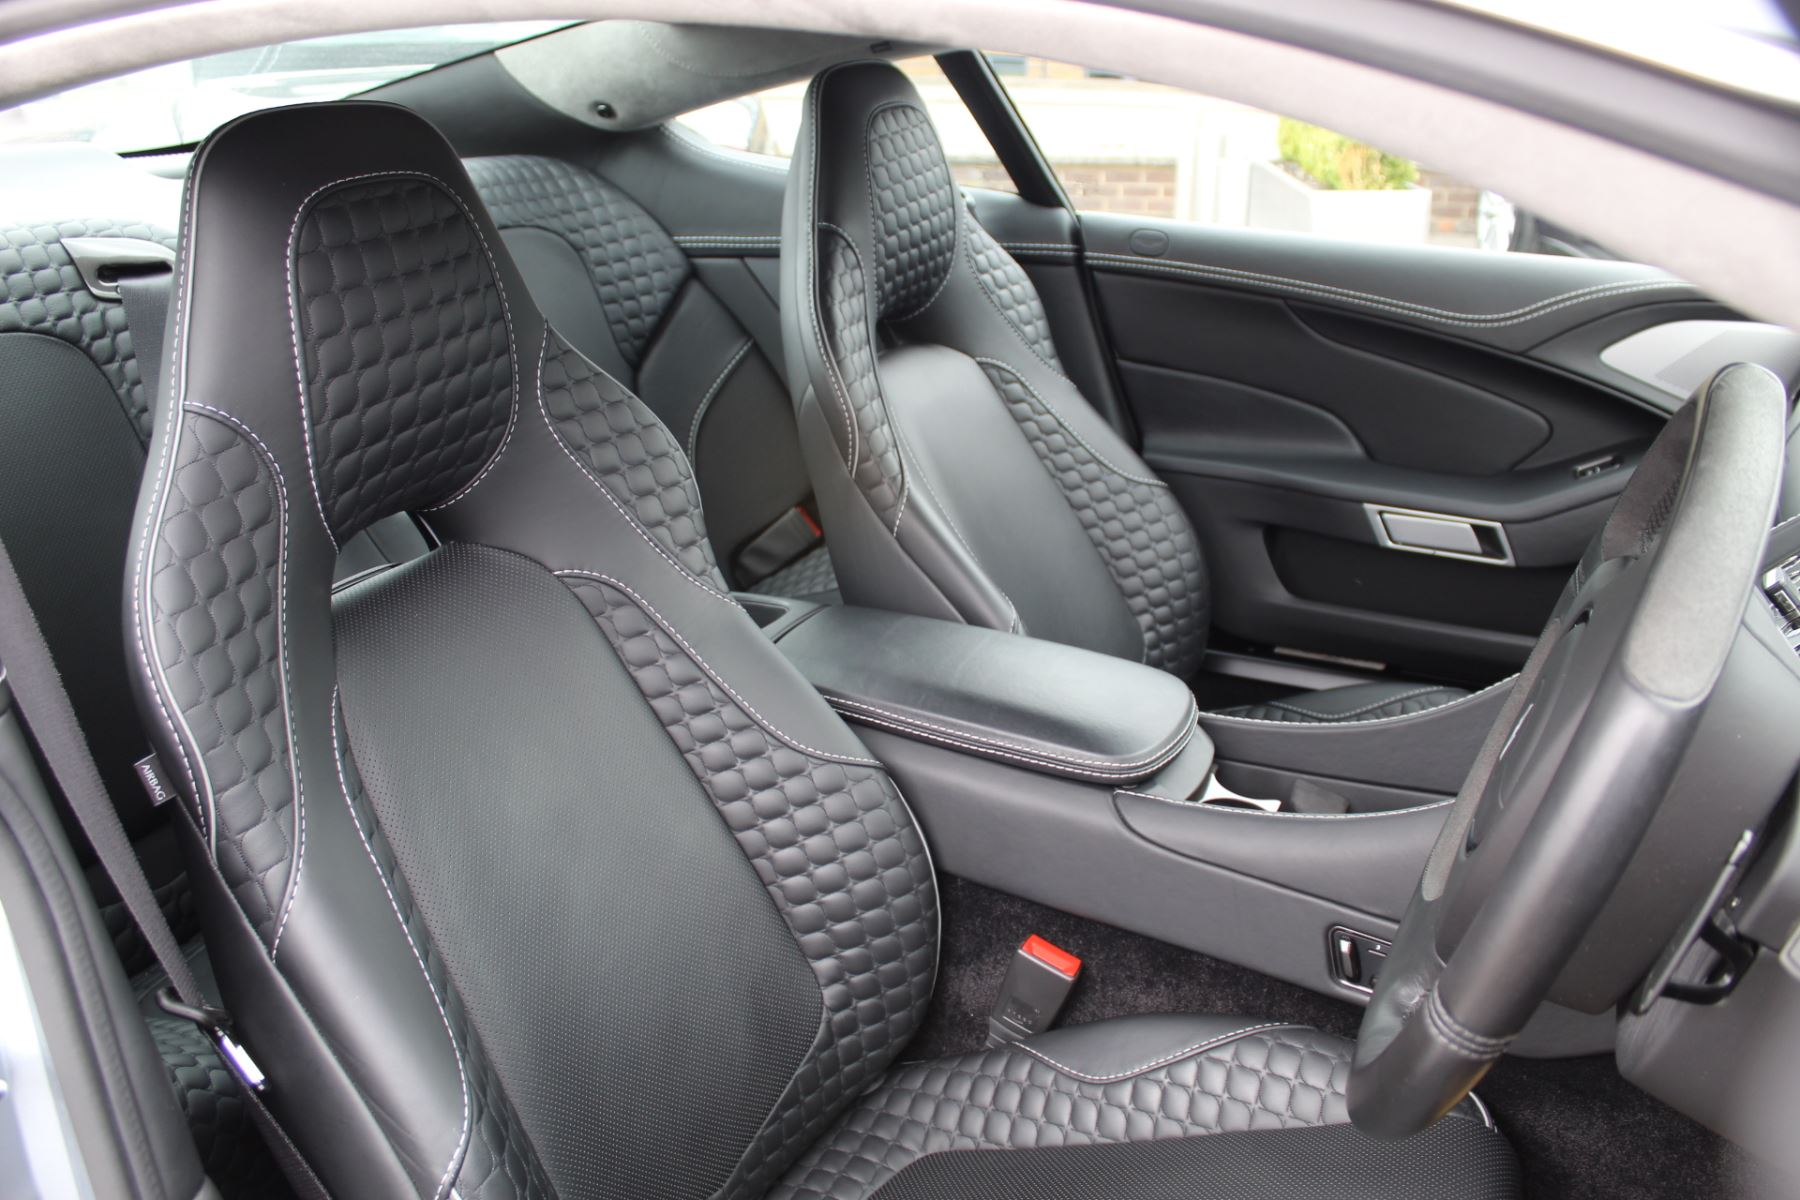 Aston Martin Vanquish V12 2+2 2dr Touchtronic image 7